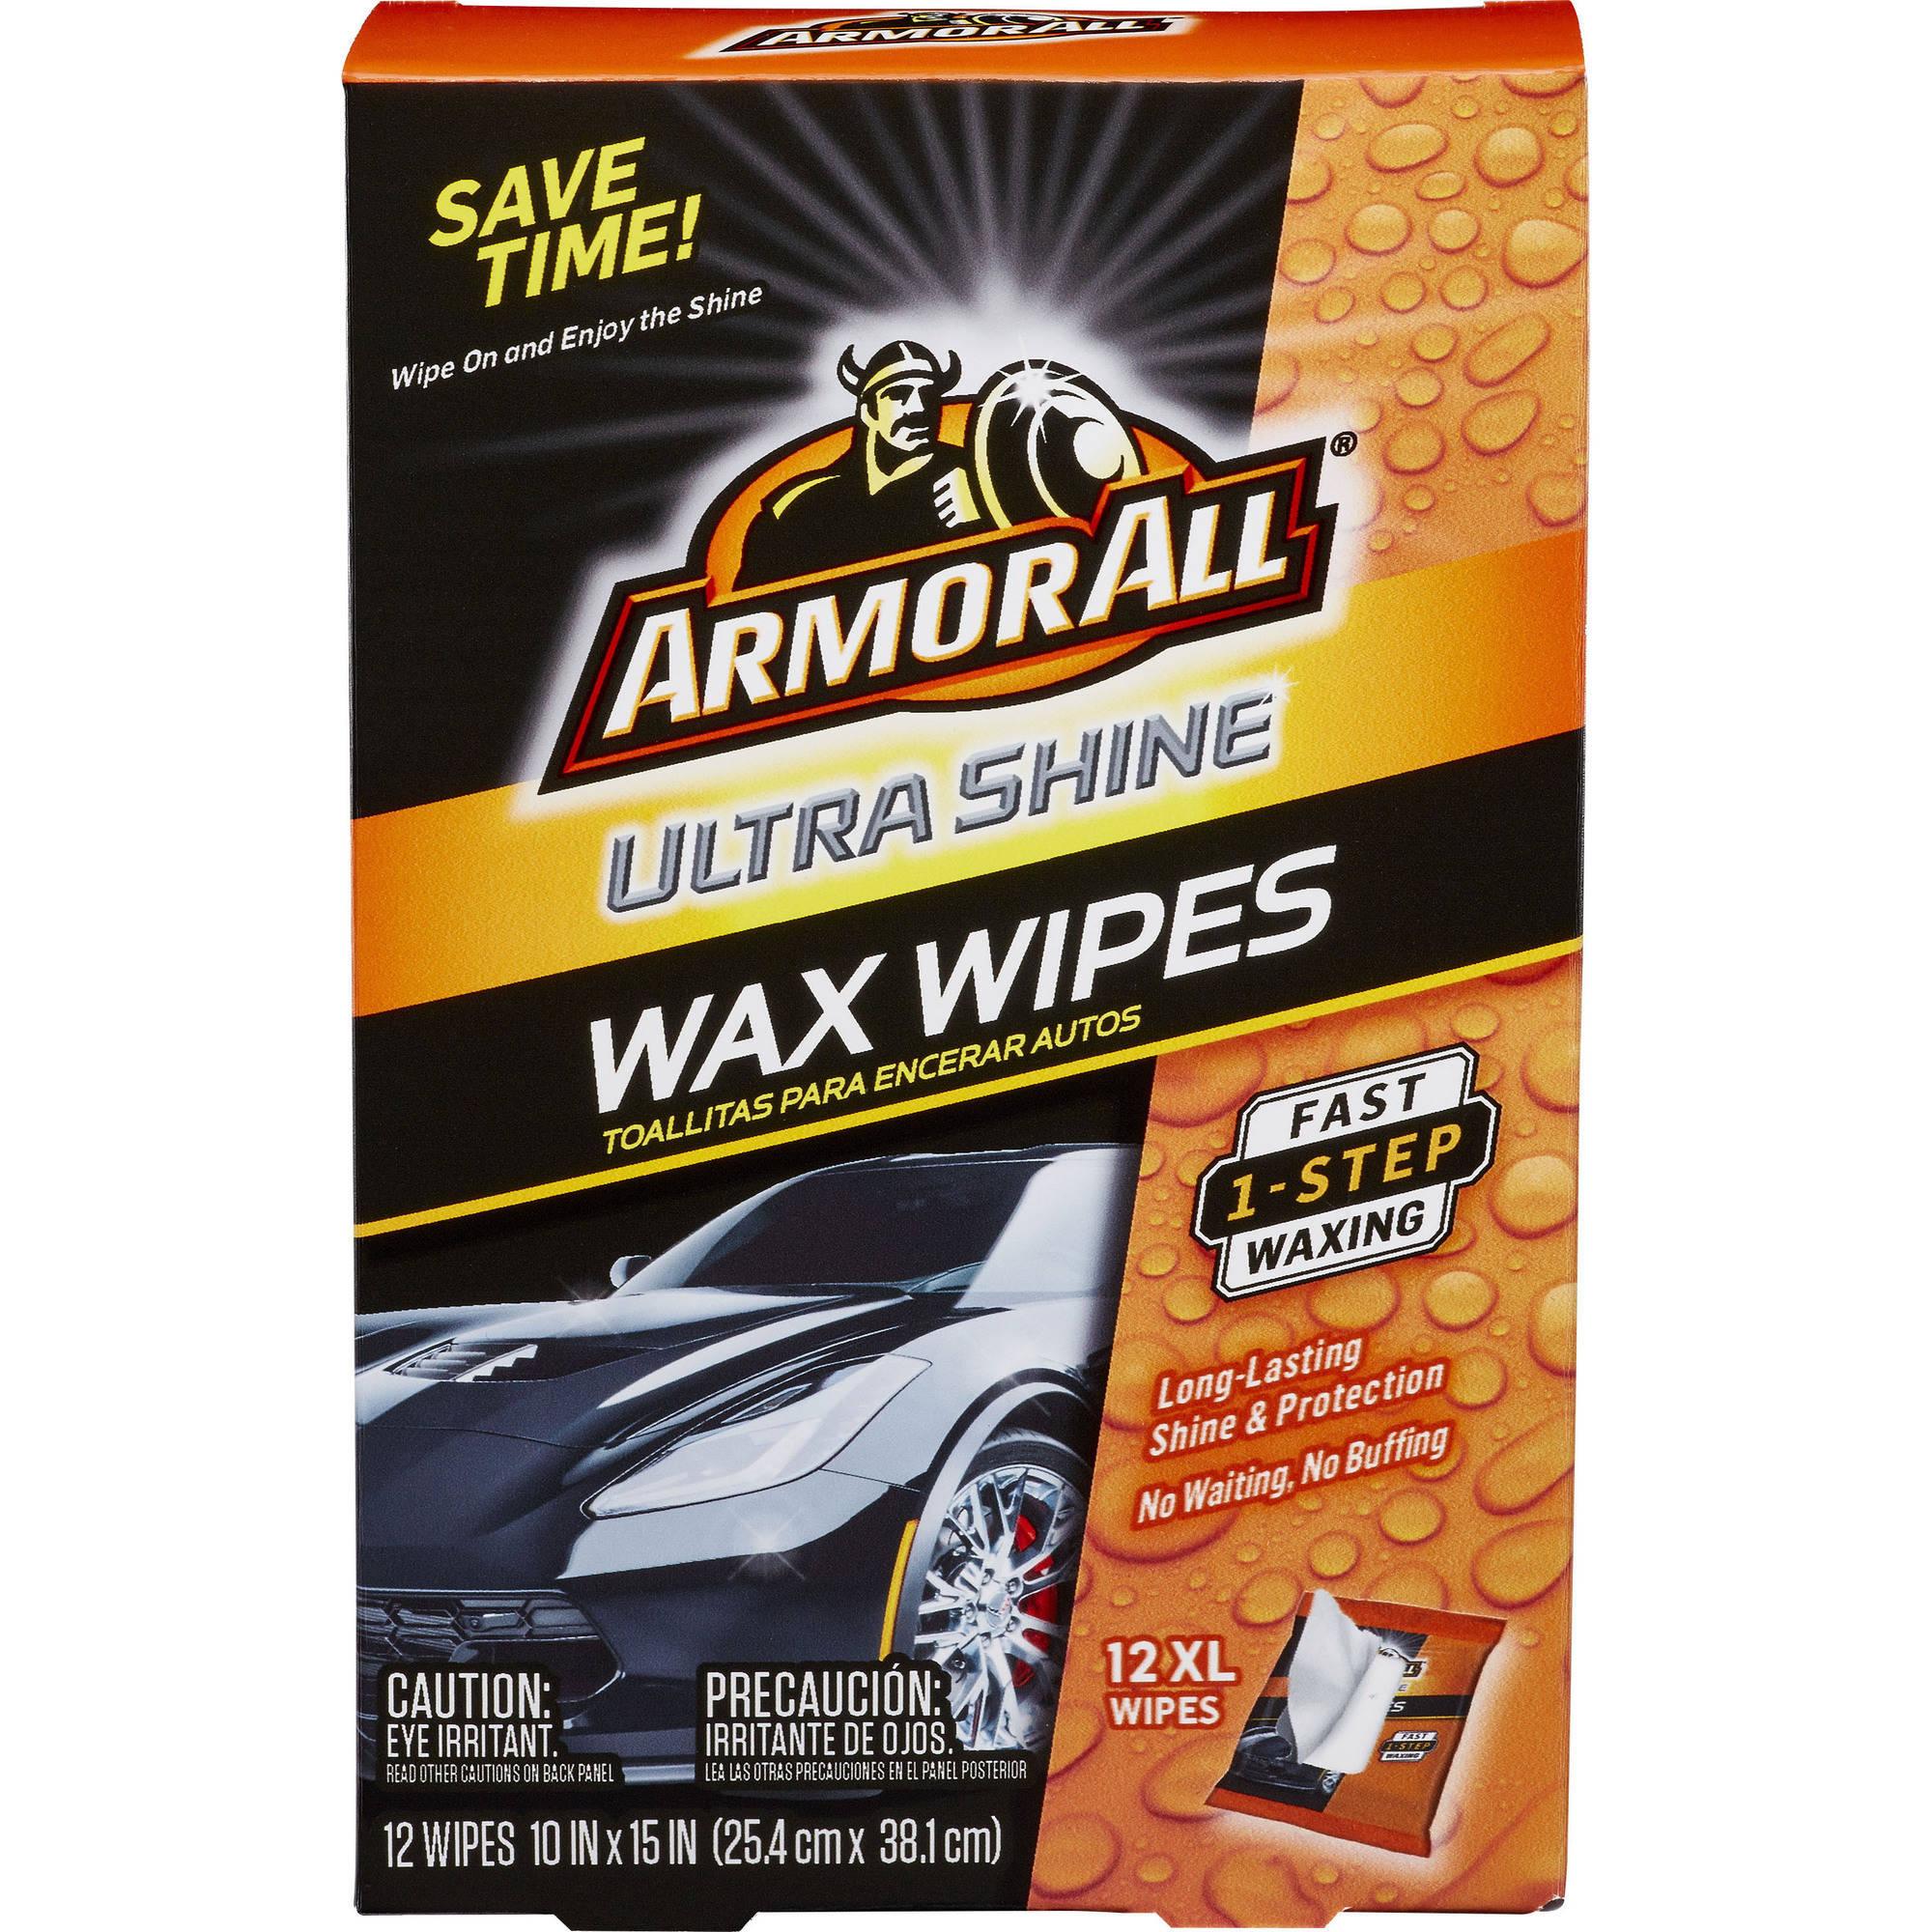 YMMV - WM Clearance - Armor All Ultra Shine Wax Wipes, 12 count, Car Wax Wipes - $0.50